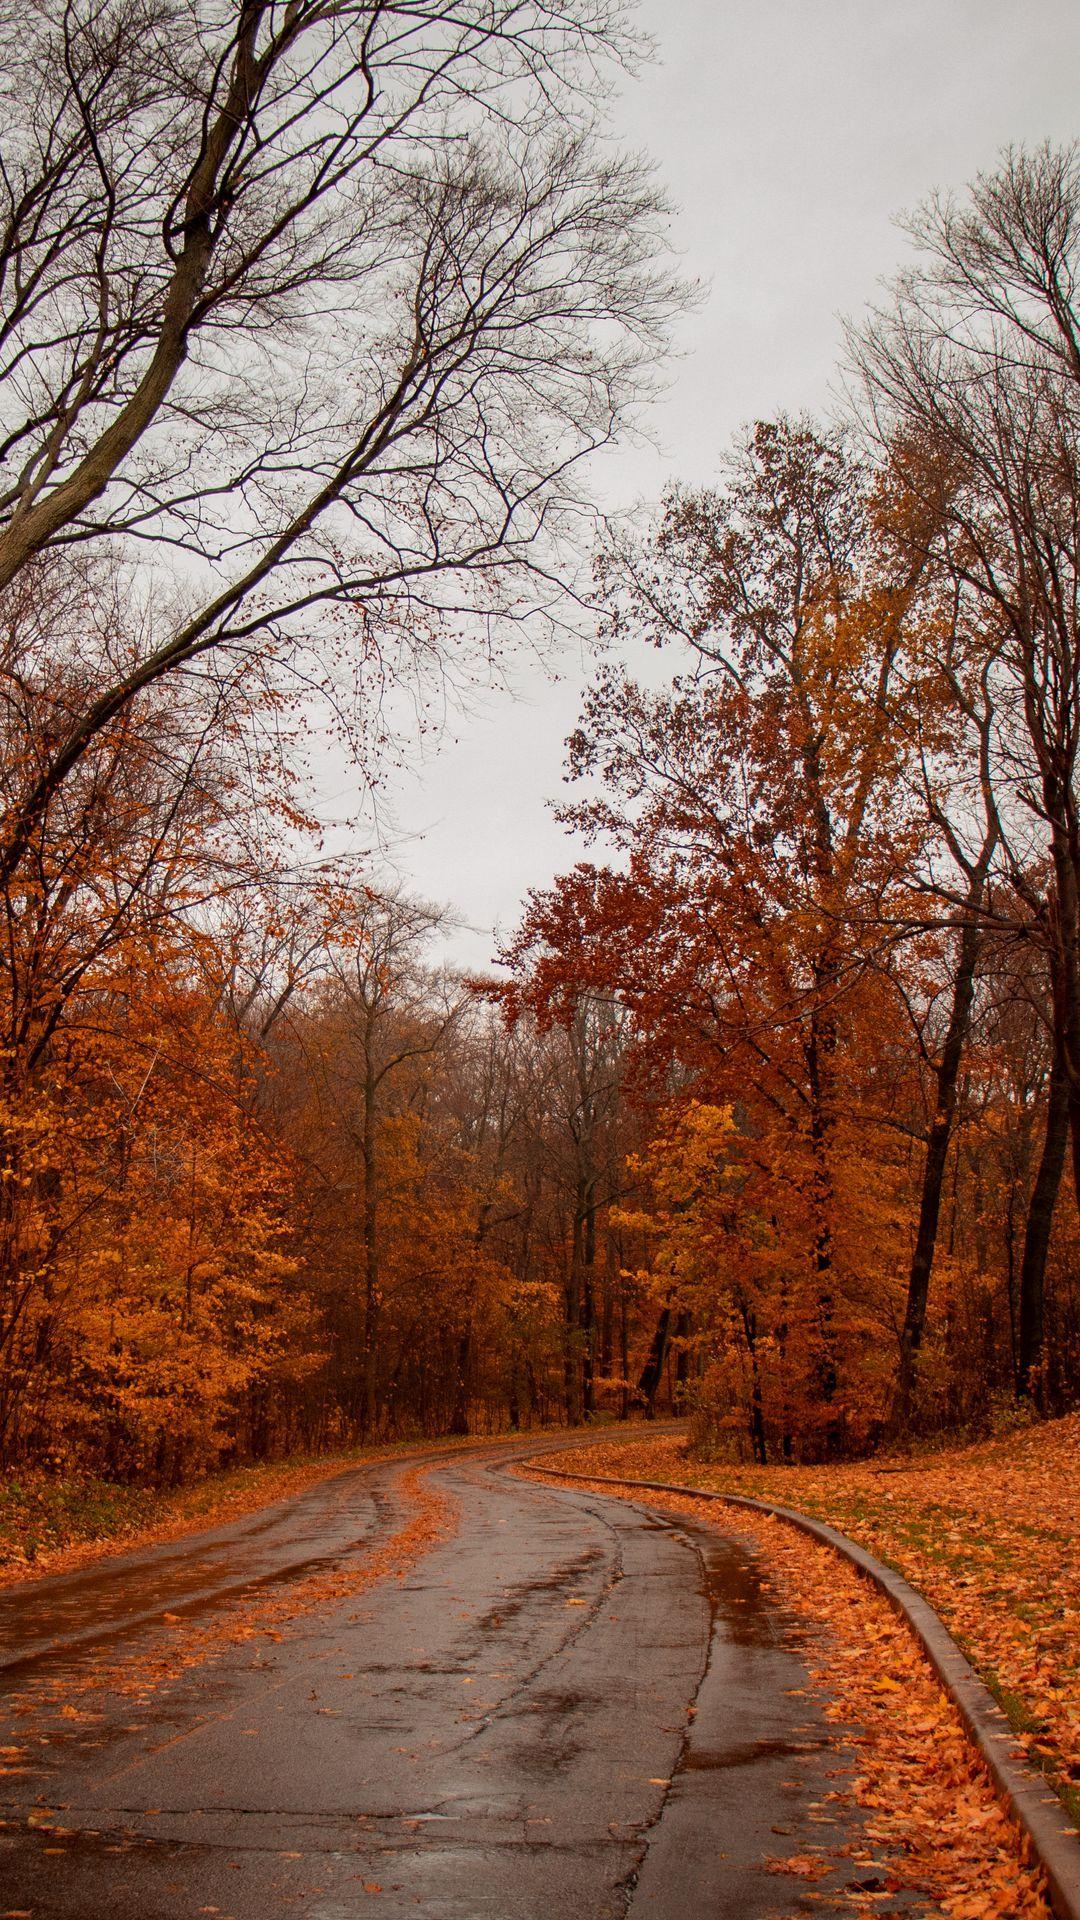 تحميل صور خلفيات مربع Country Roads Country Road